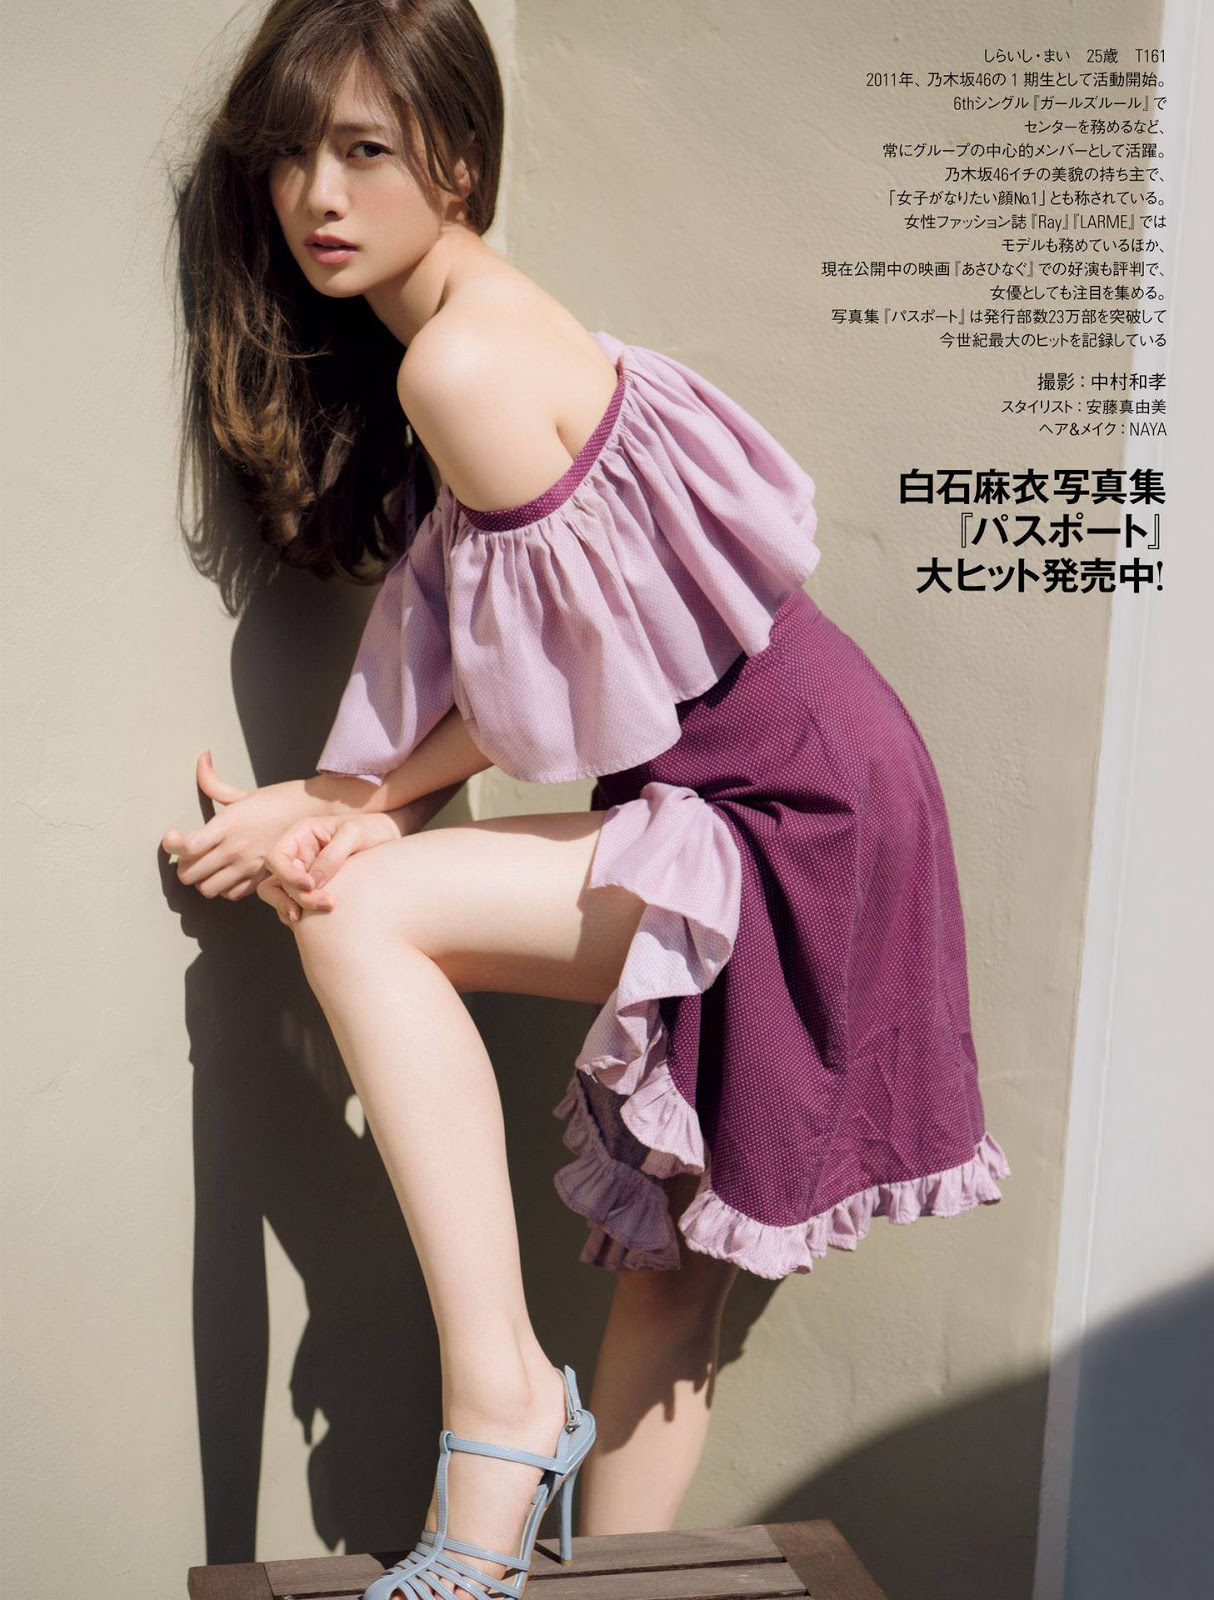 Shiraishi Mai 白石麻衣, FRIDAY 2017.10.16 (フライデー 2017年10月16日号)